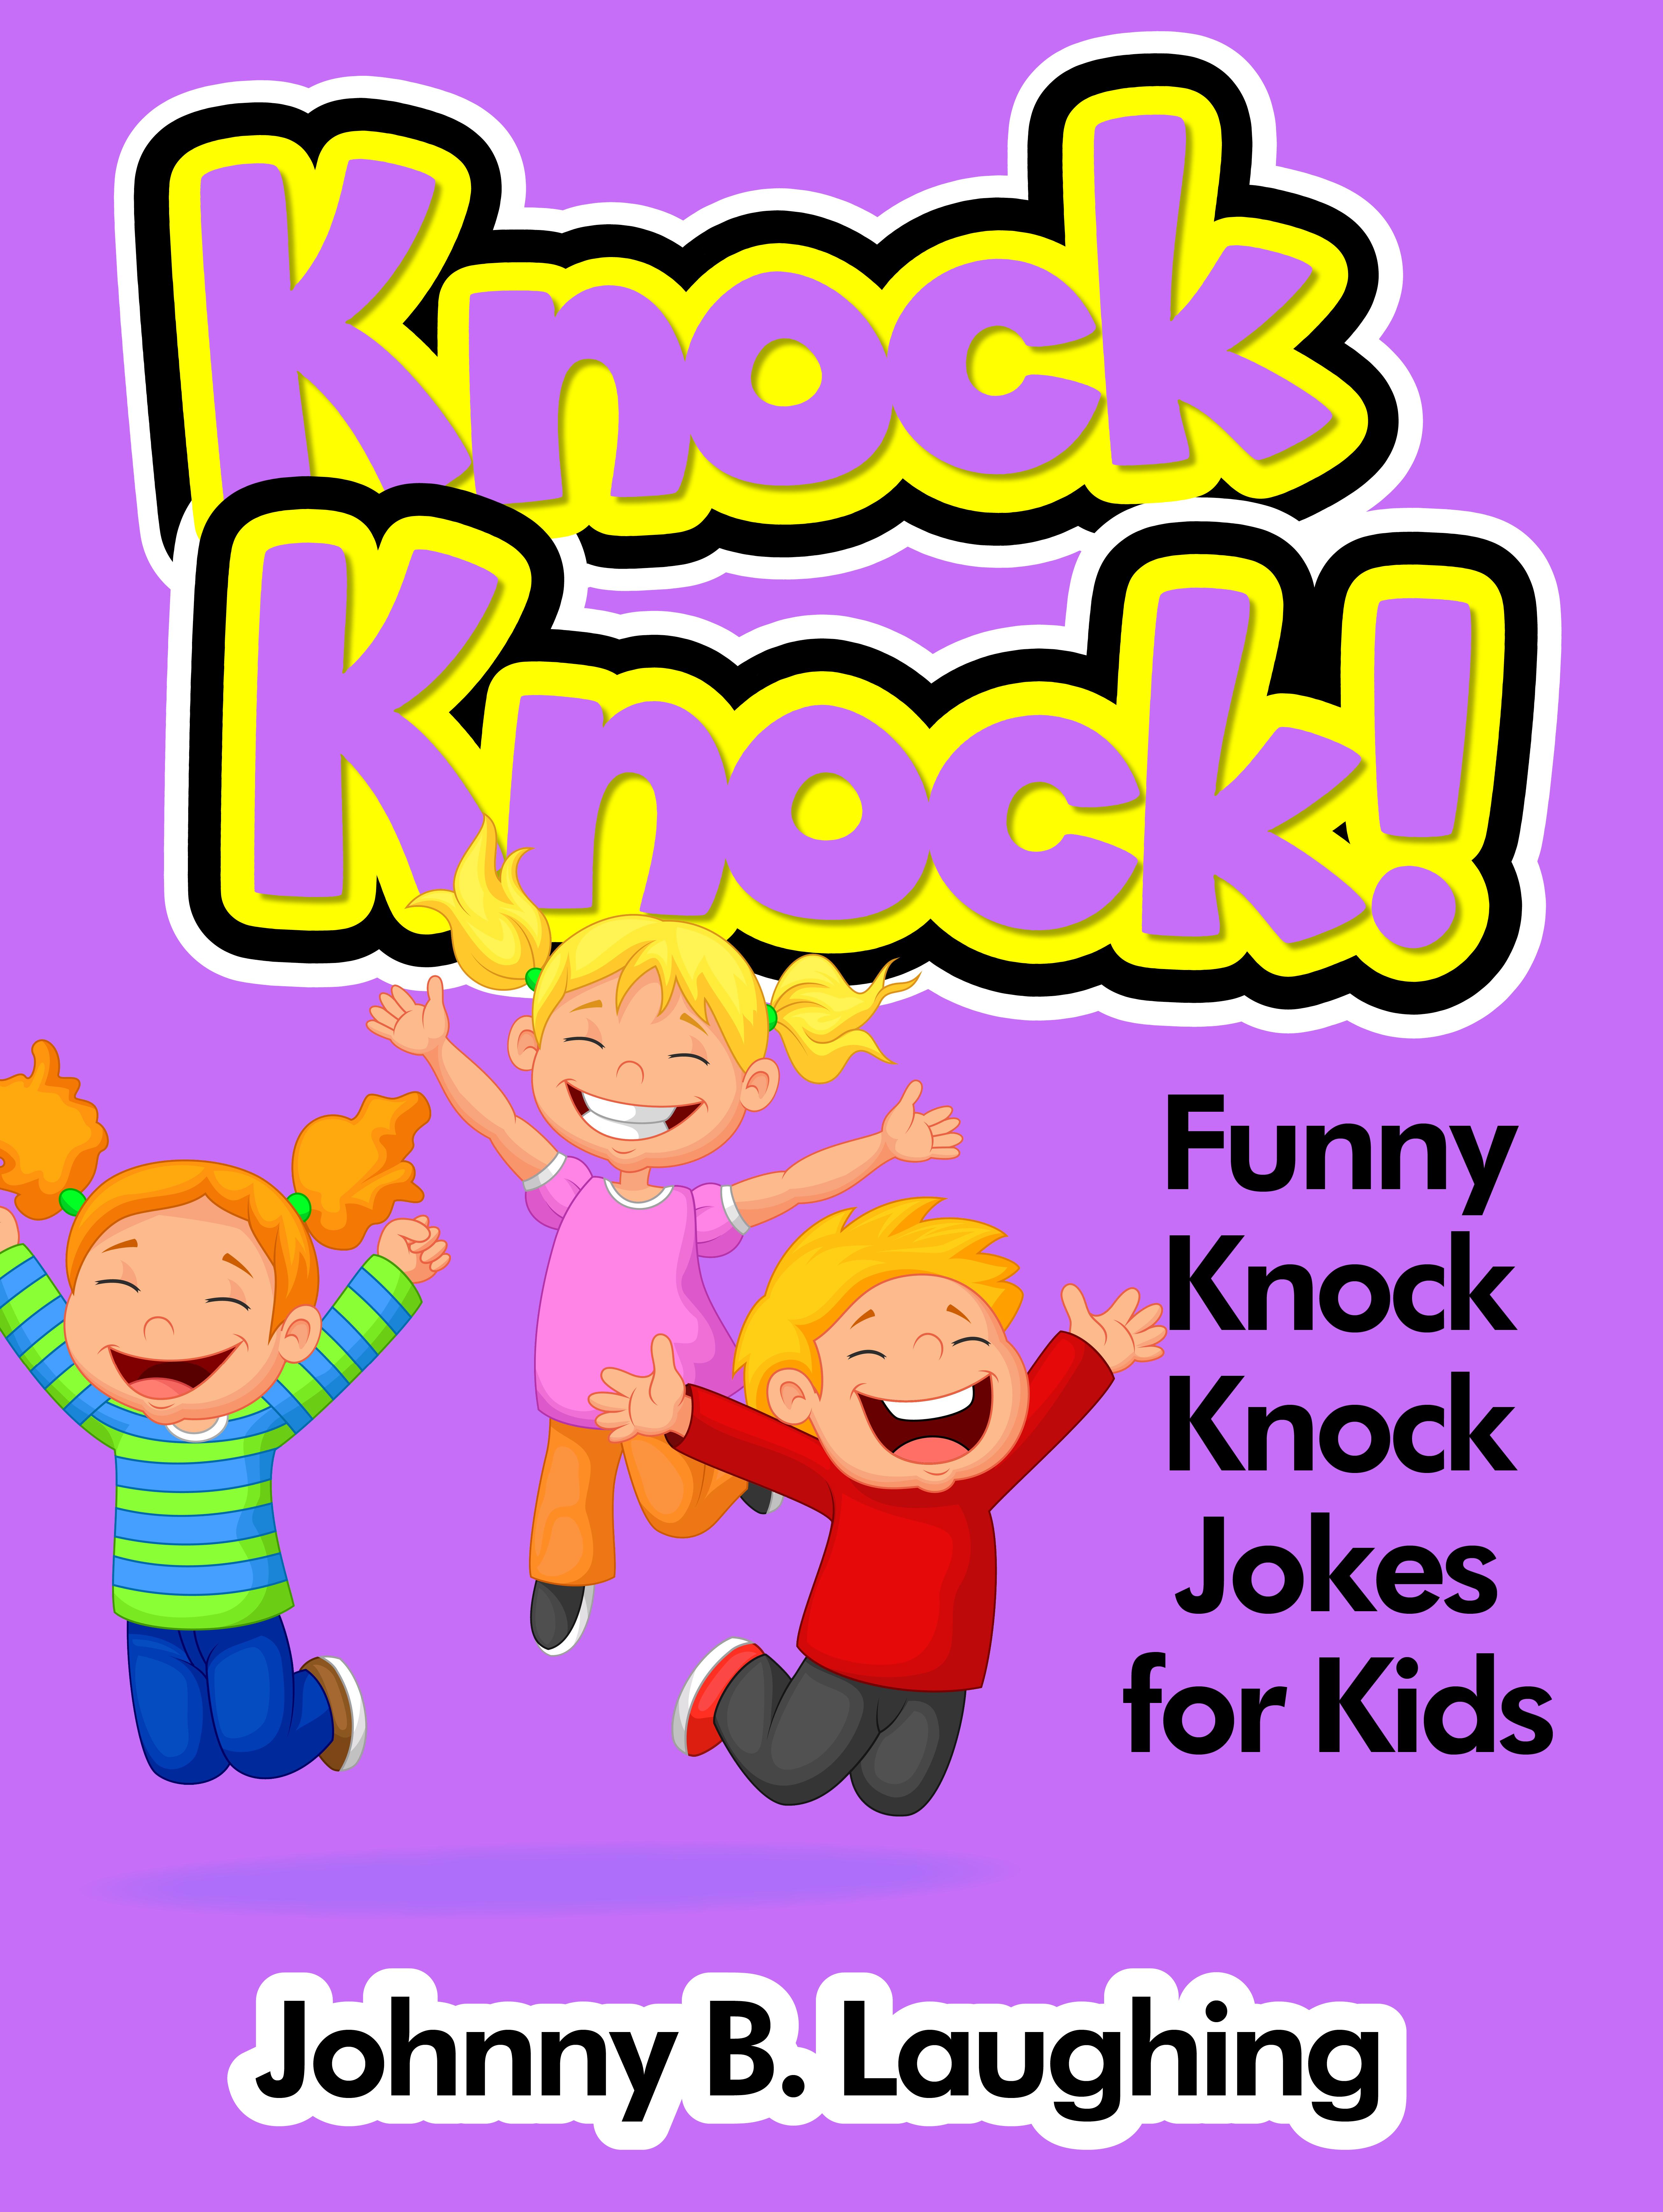 Hilarious Knock Knock Jokes For Kids